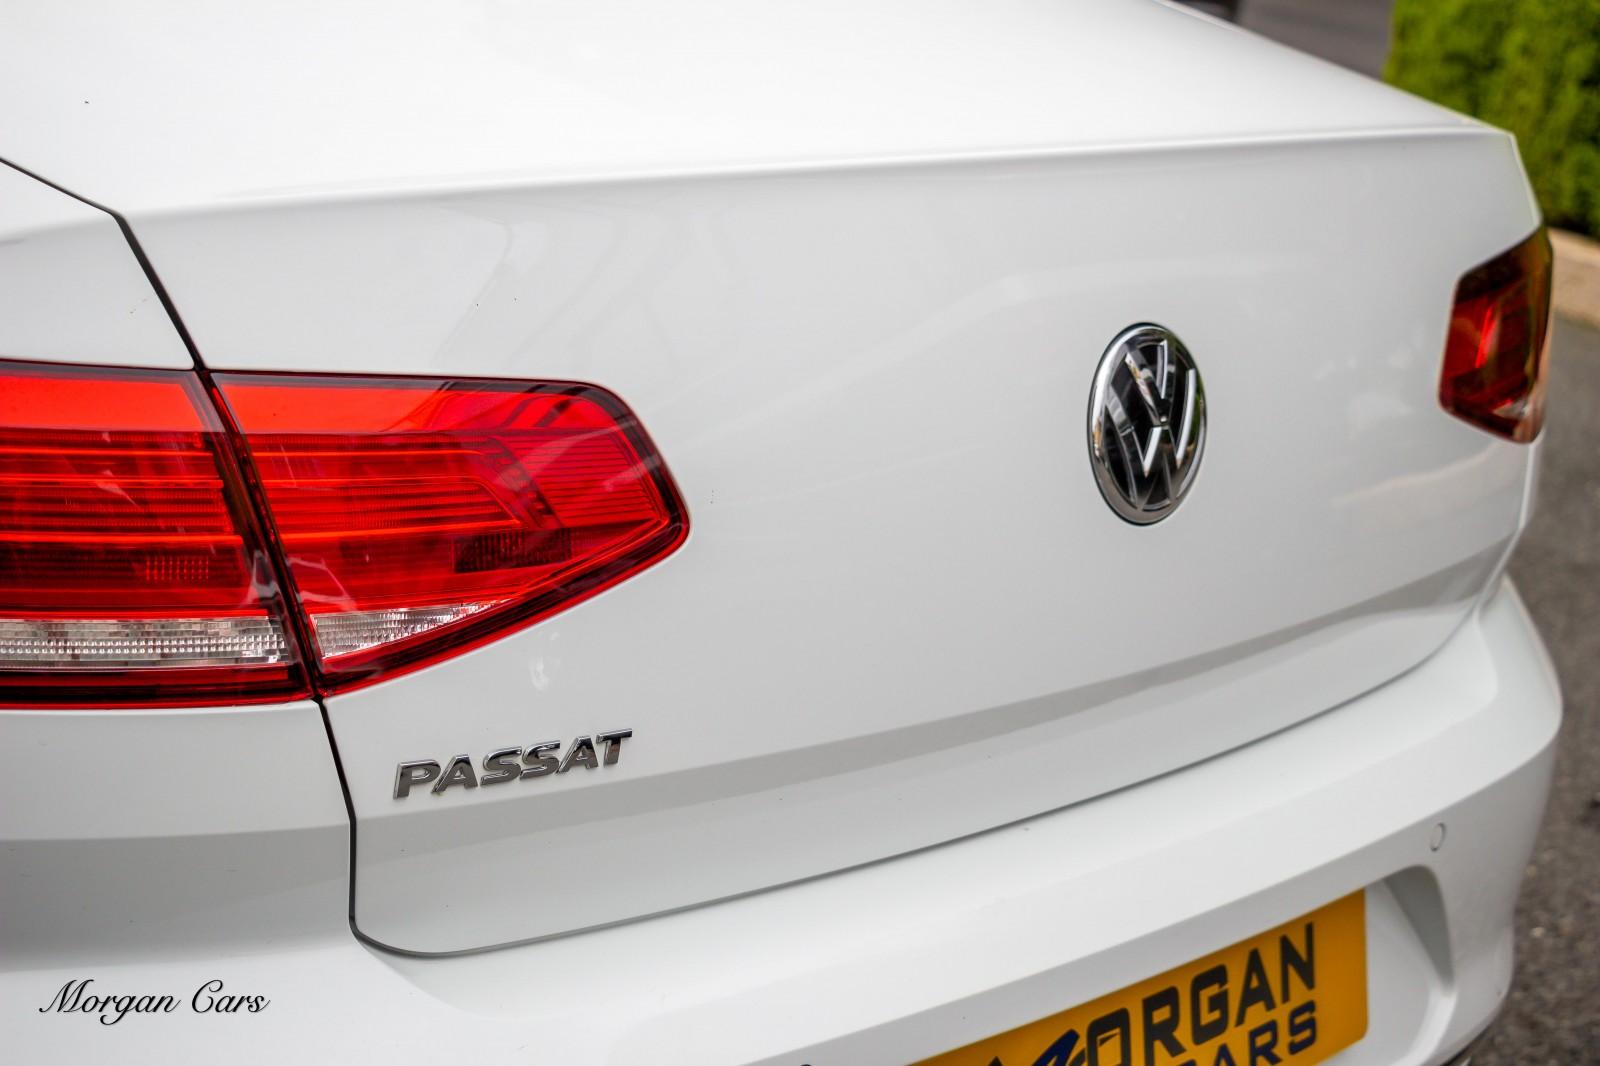 2018 Volkswagen Passat R LINE TDI BLUEMOTION TECHNOLOGY DSG Diesel Semi Auto – Morgan Cars 9 Mound Road, Warrenpoint, Newry BT34 3LW, UK full